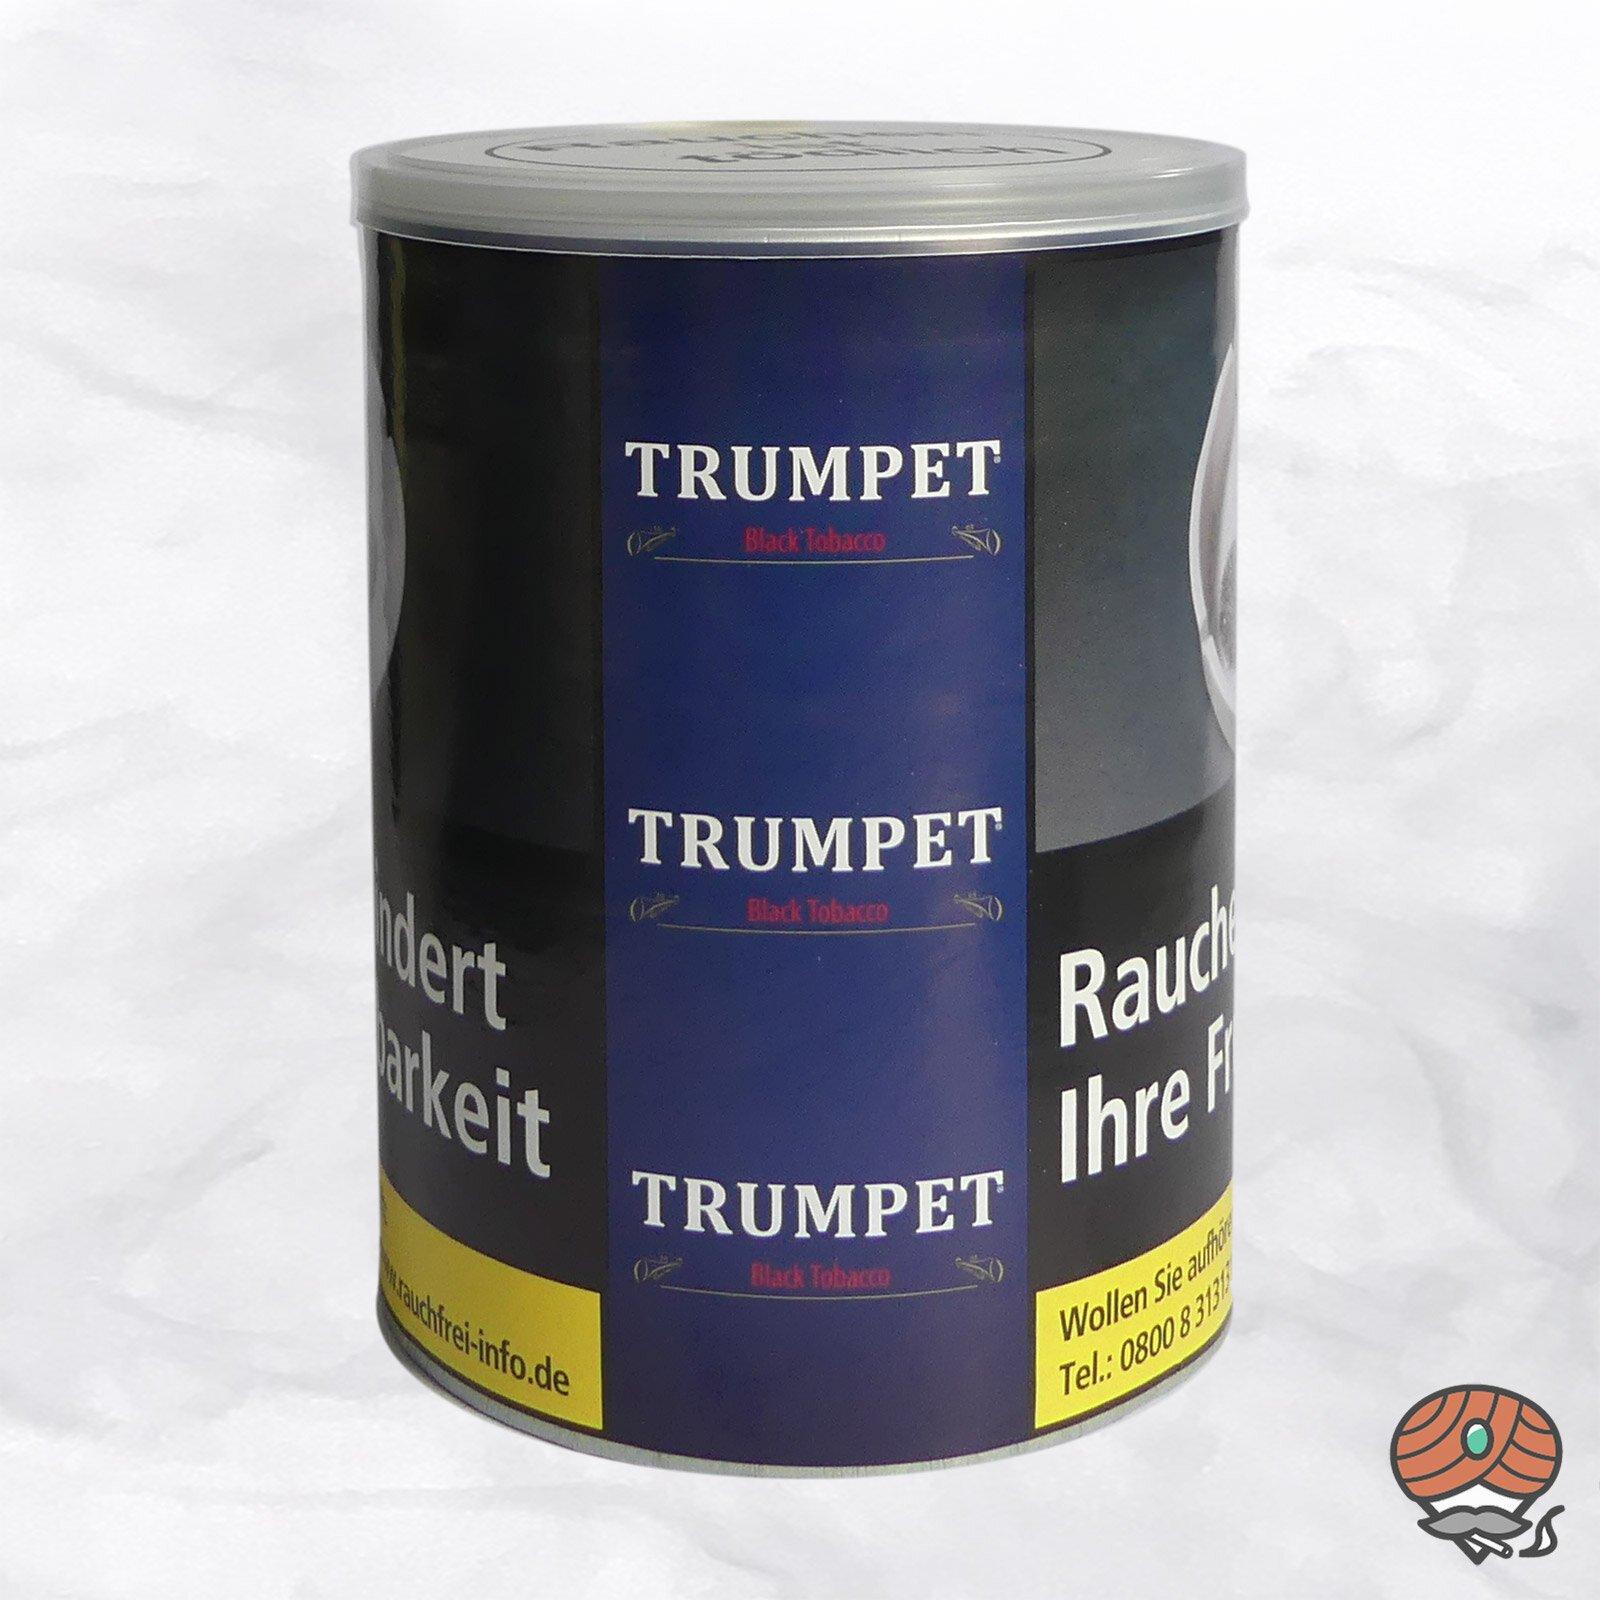 Trumpet Black Tobacco Drehtabak 130 g Dose